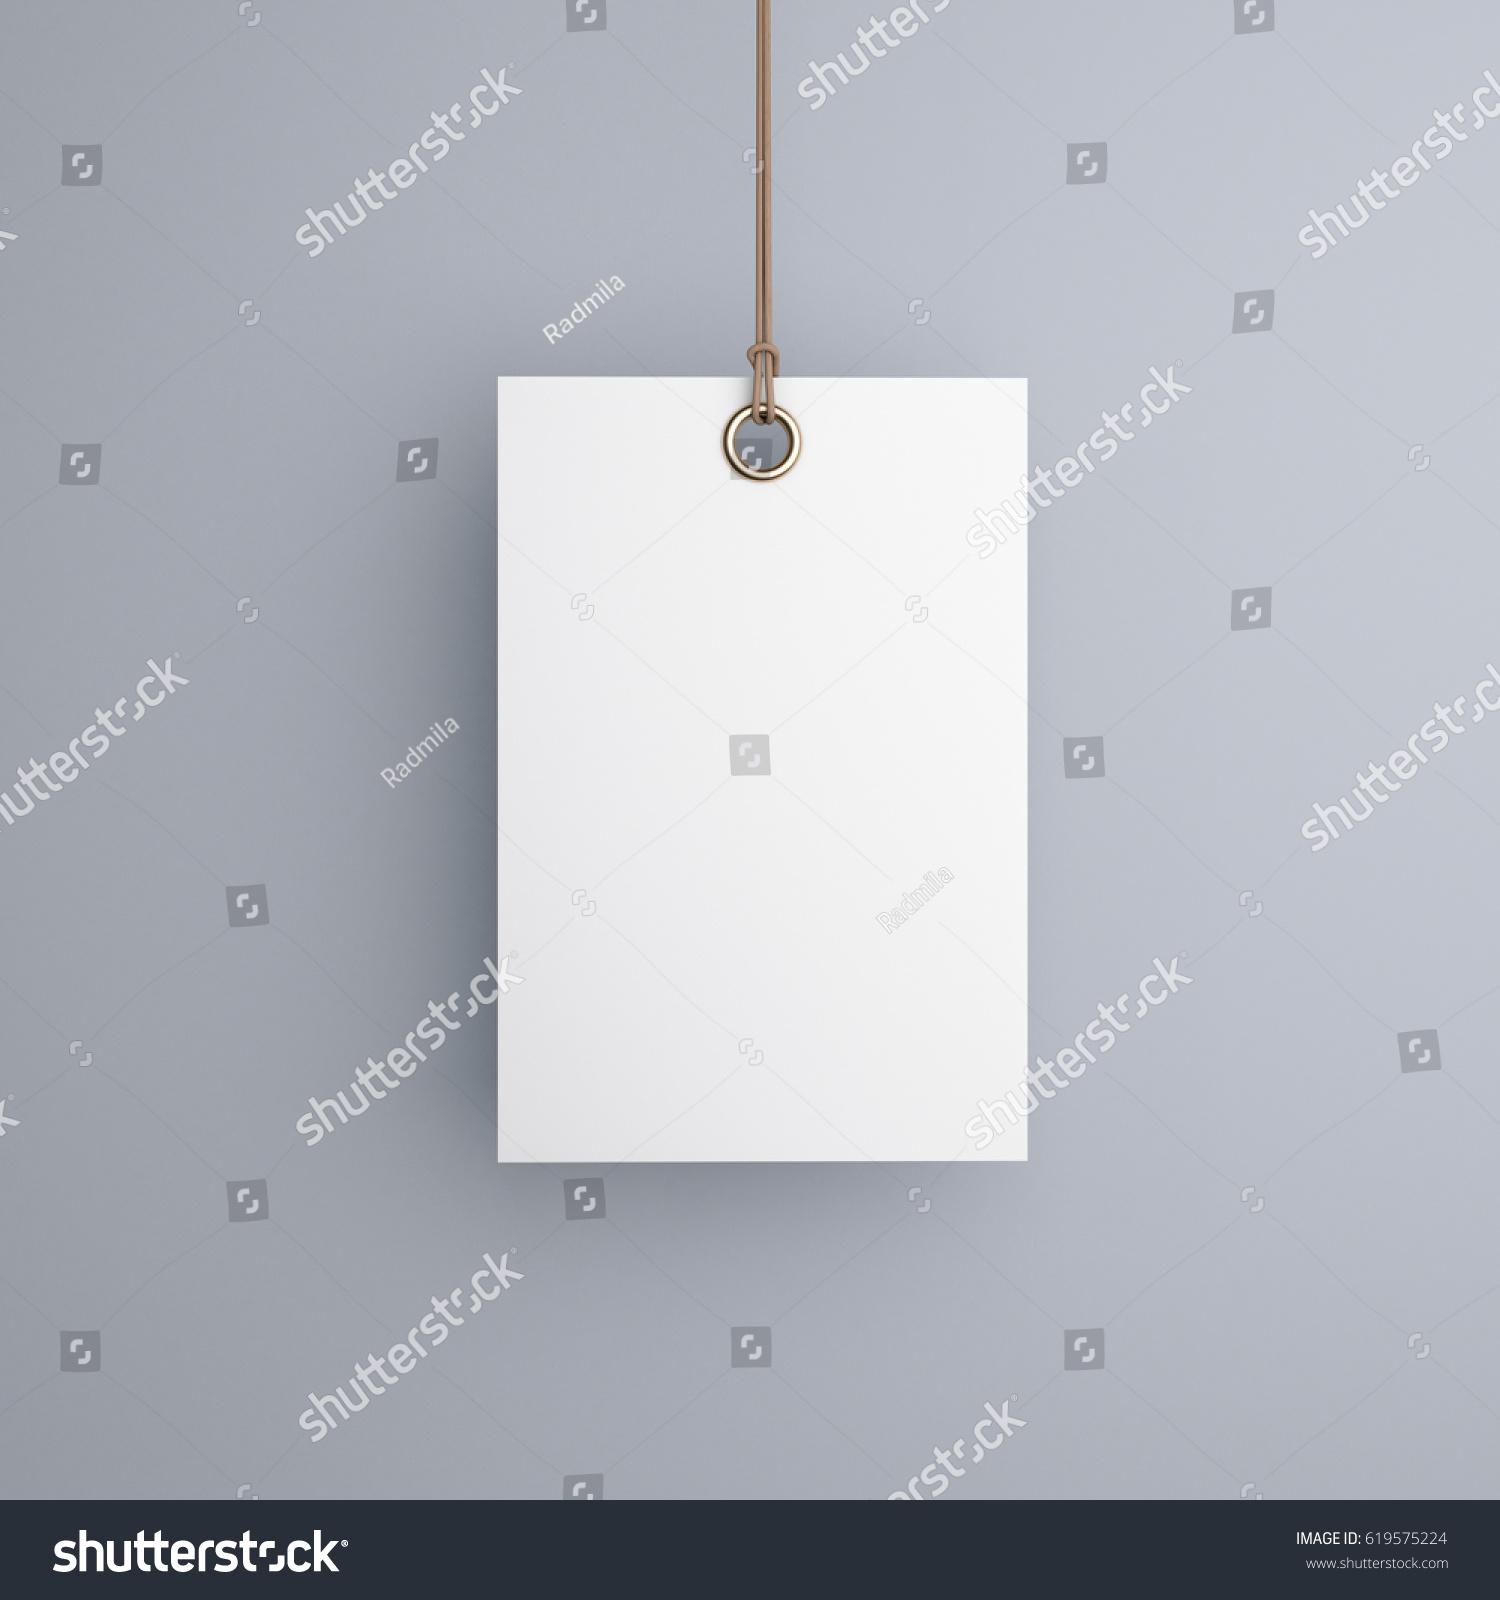 Label Blank Mockup 3 D Rendering Stock Illustration - Royalty Free ...